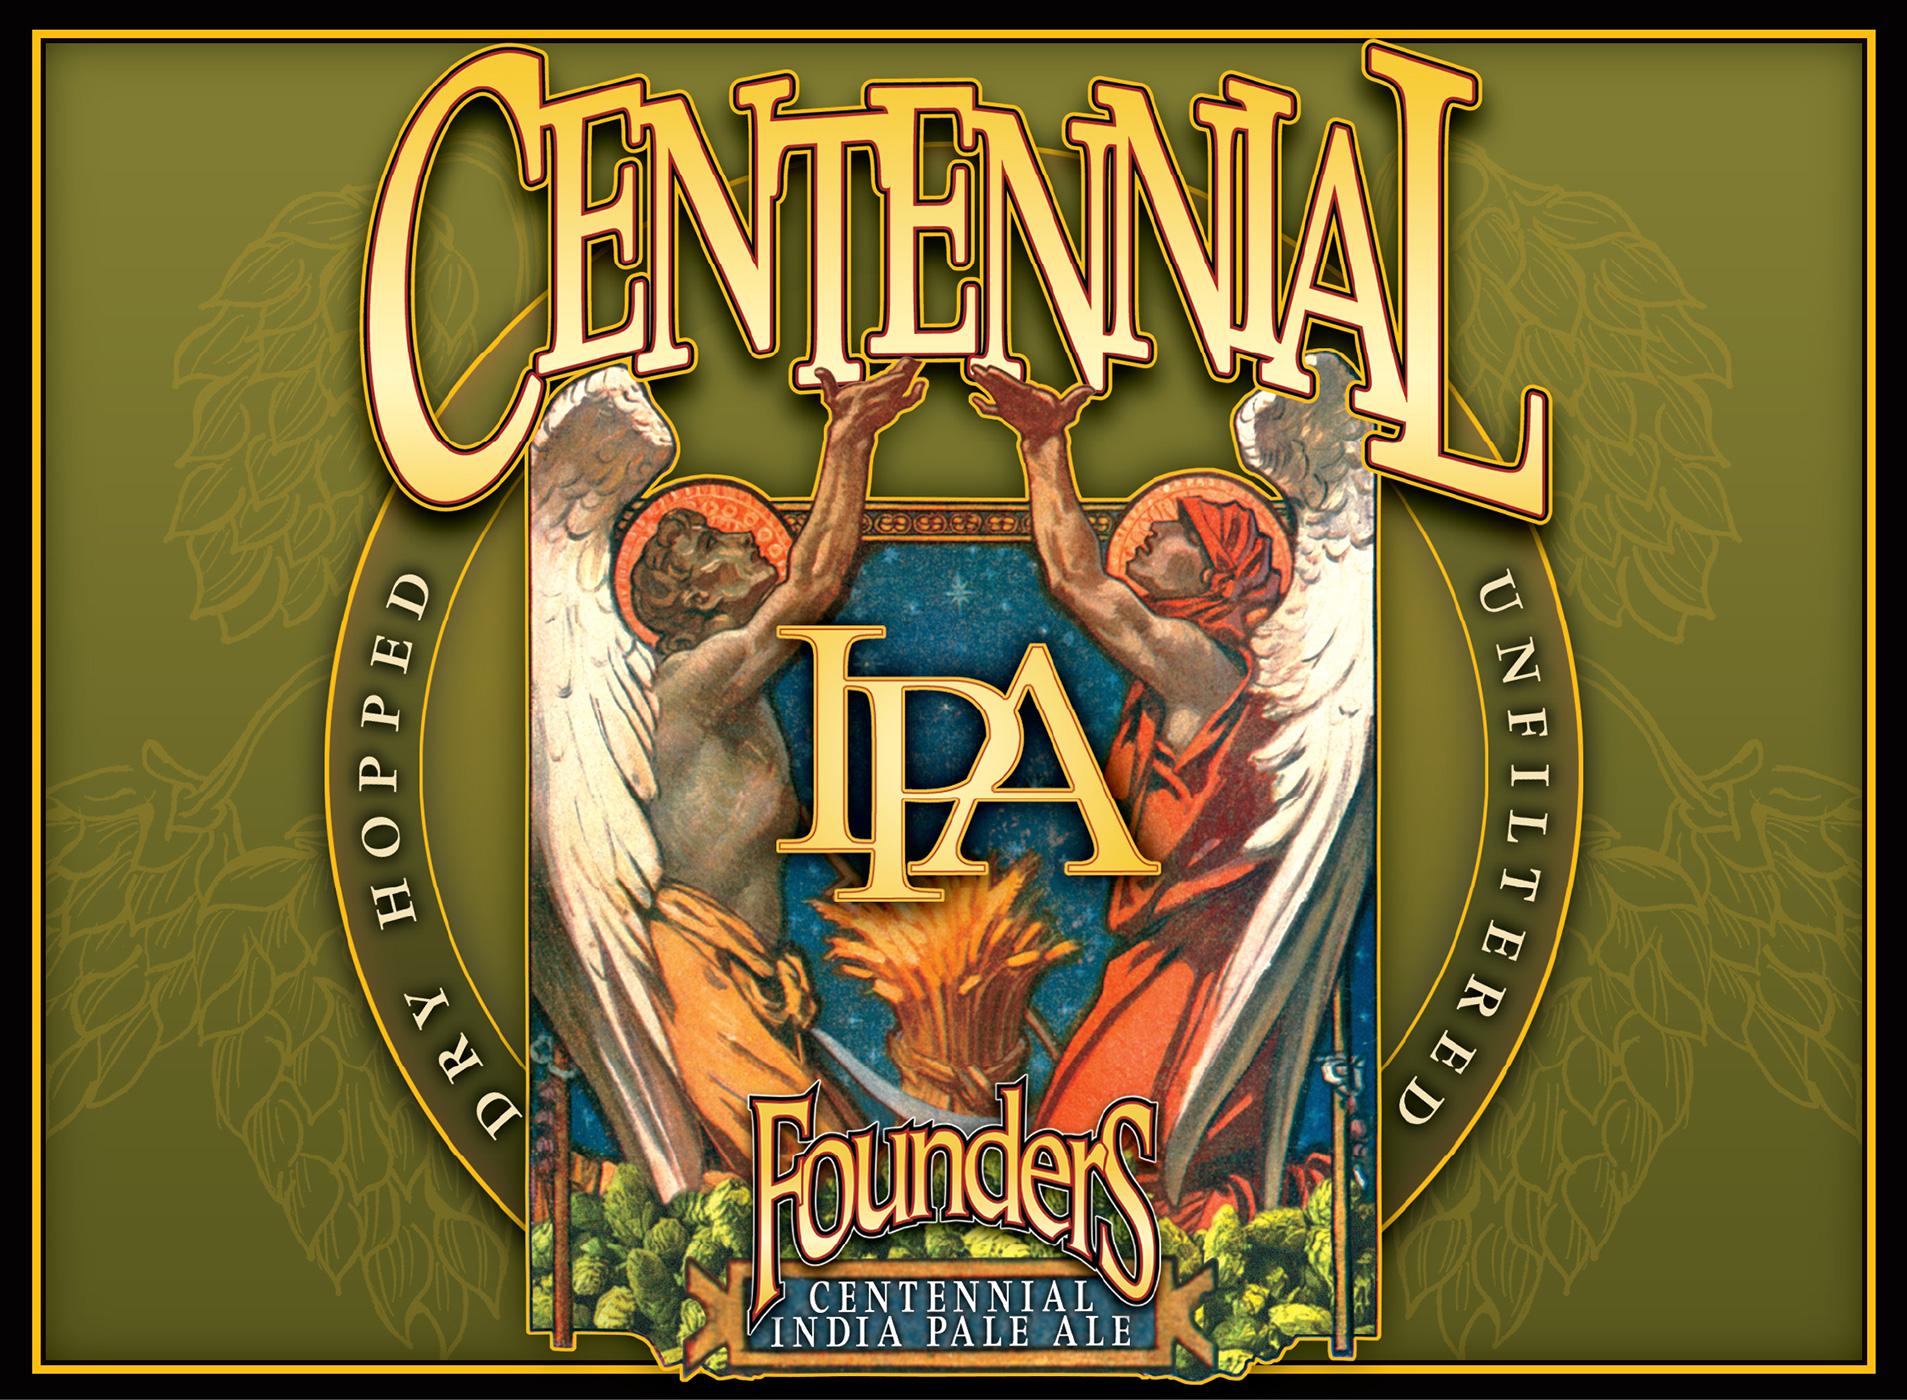 Founder Centennial IPA Image